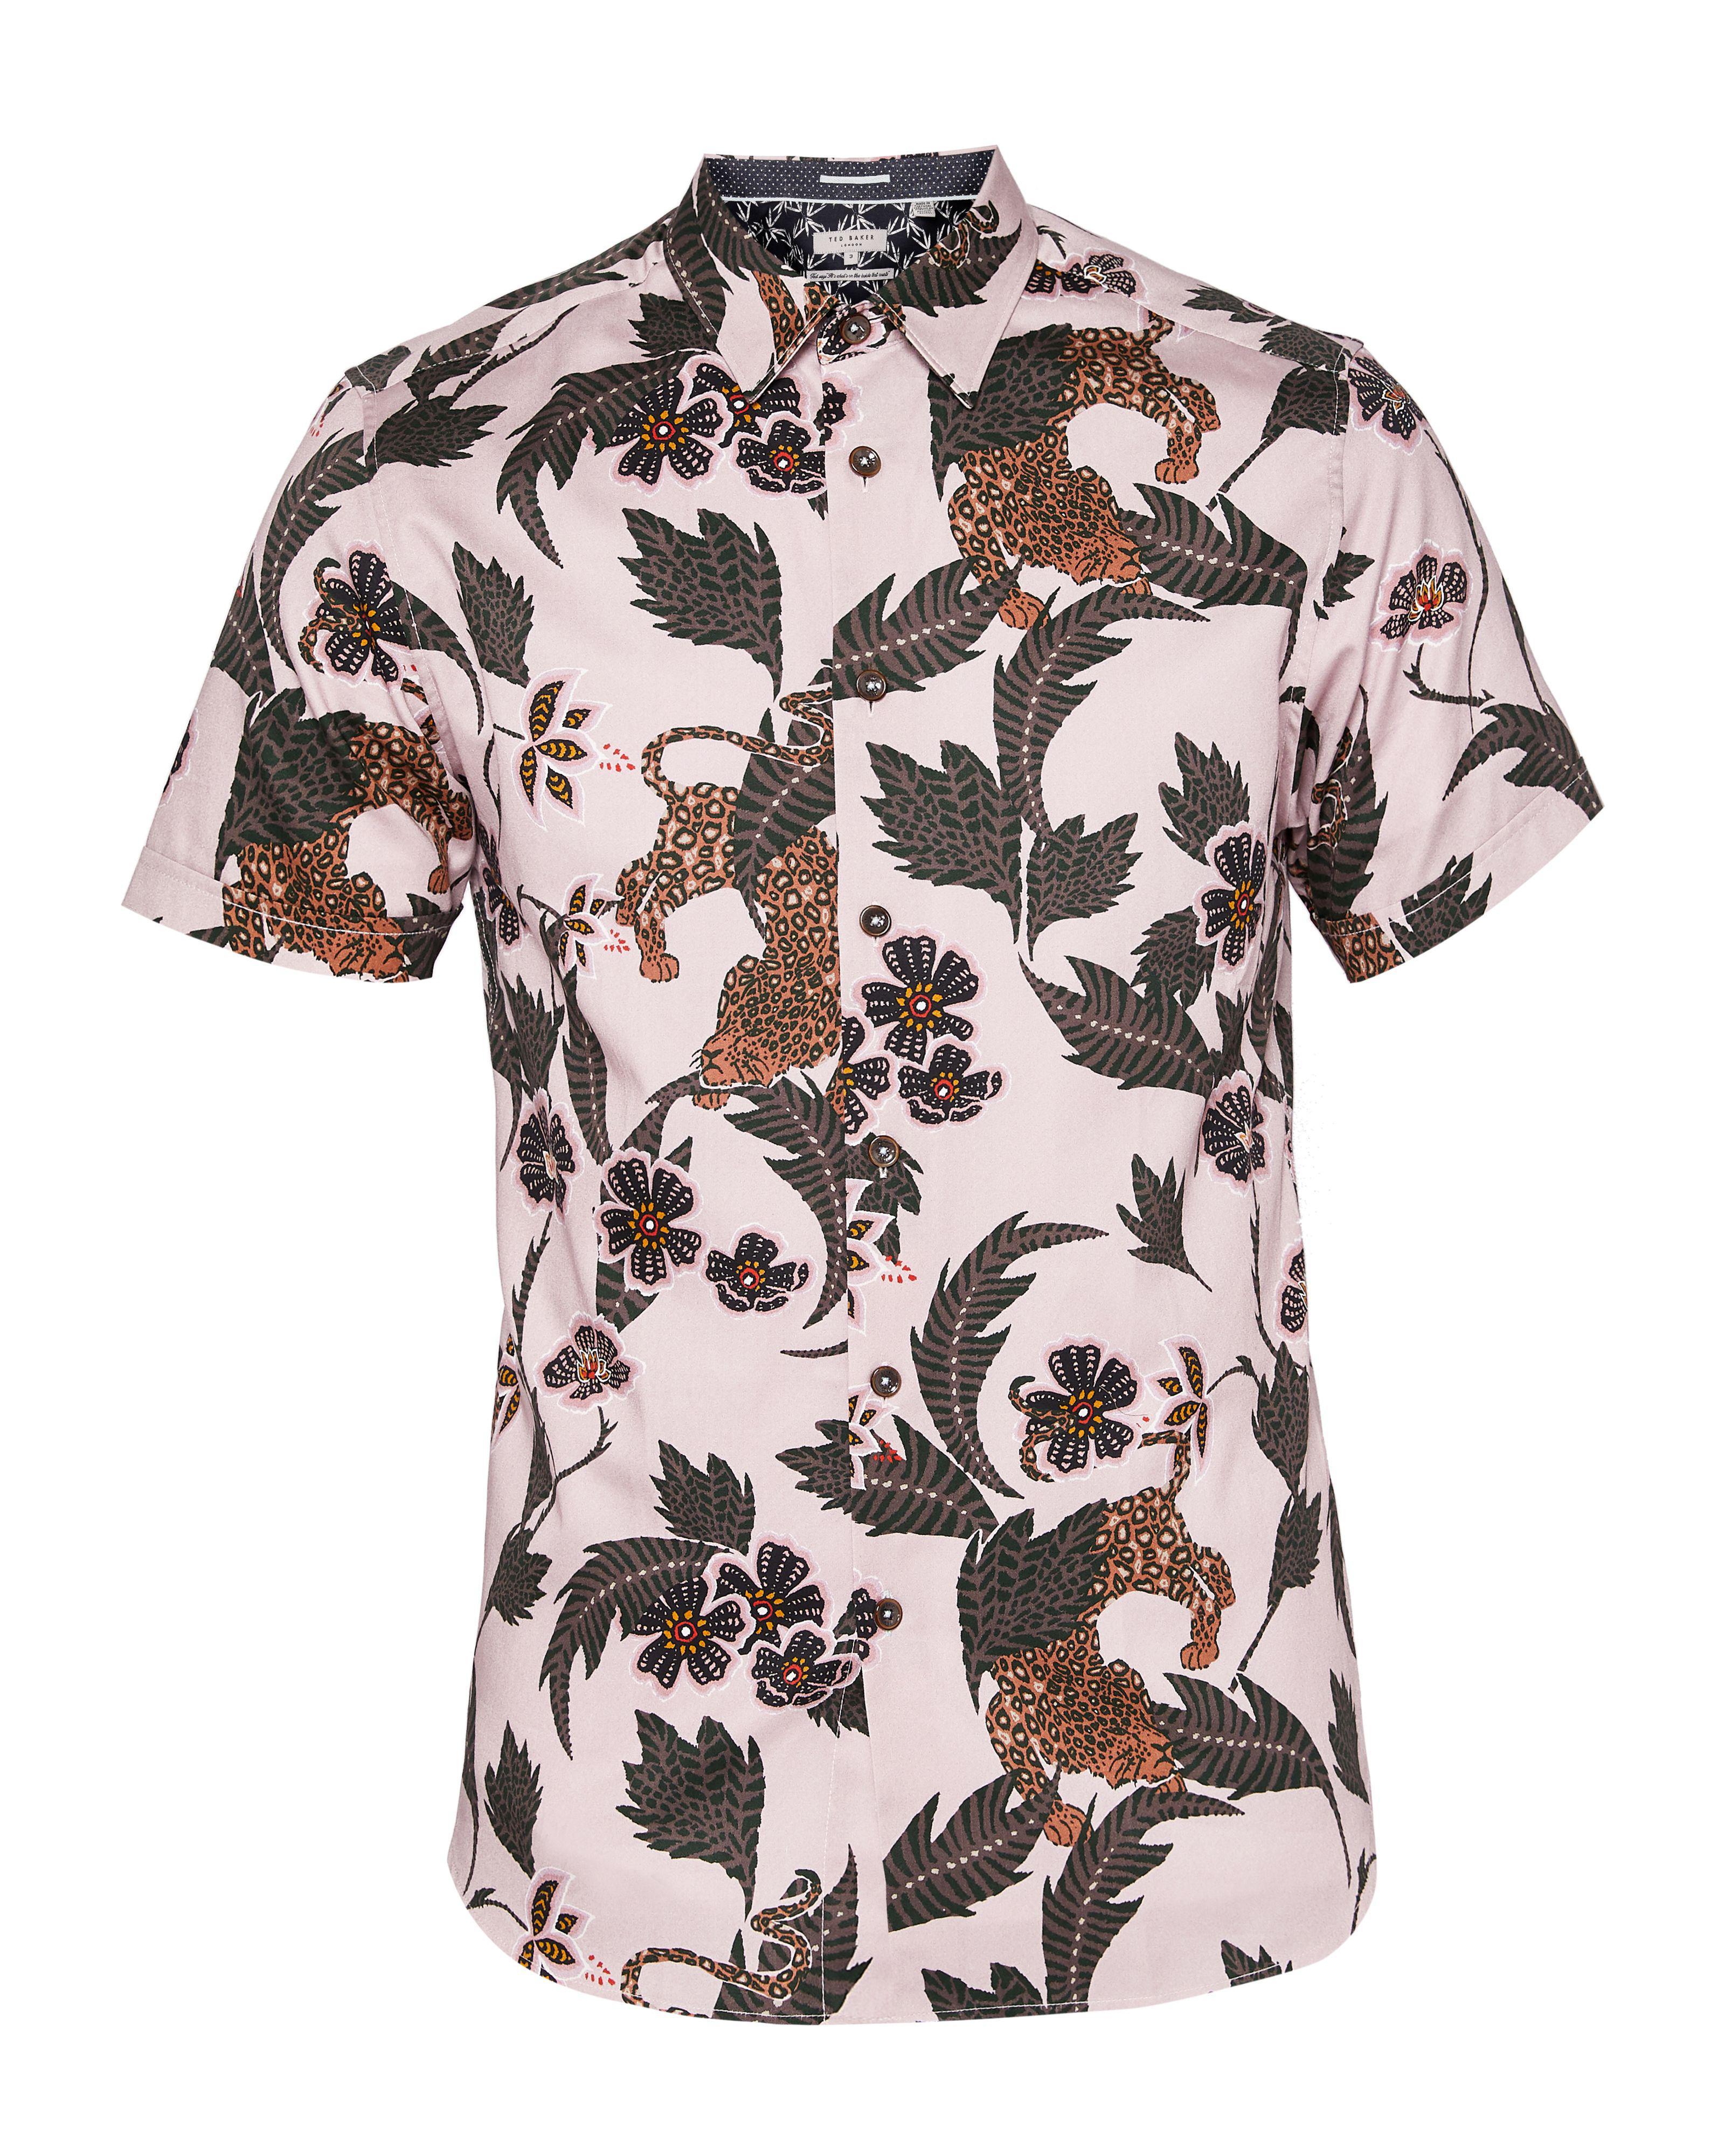 9b7983f4ac39 Ted Baker - Pink Men's Lepord Ss Leopard Print Shirt for Men - Lyst. View  fullscreen